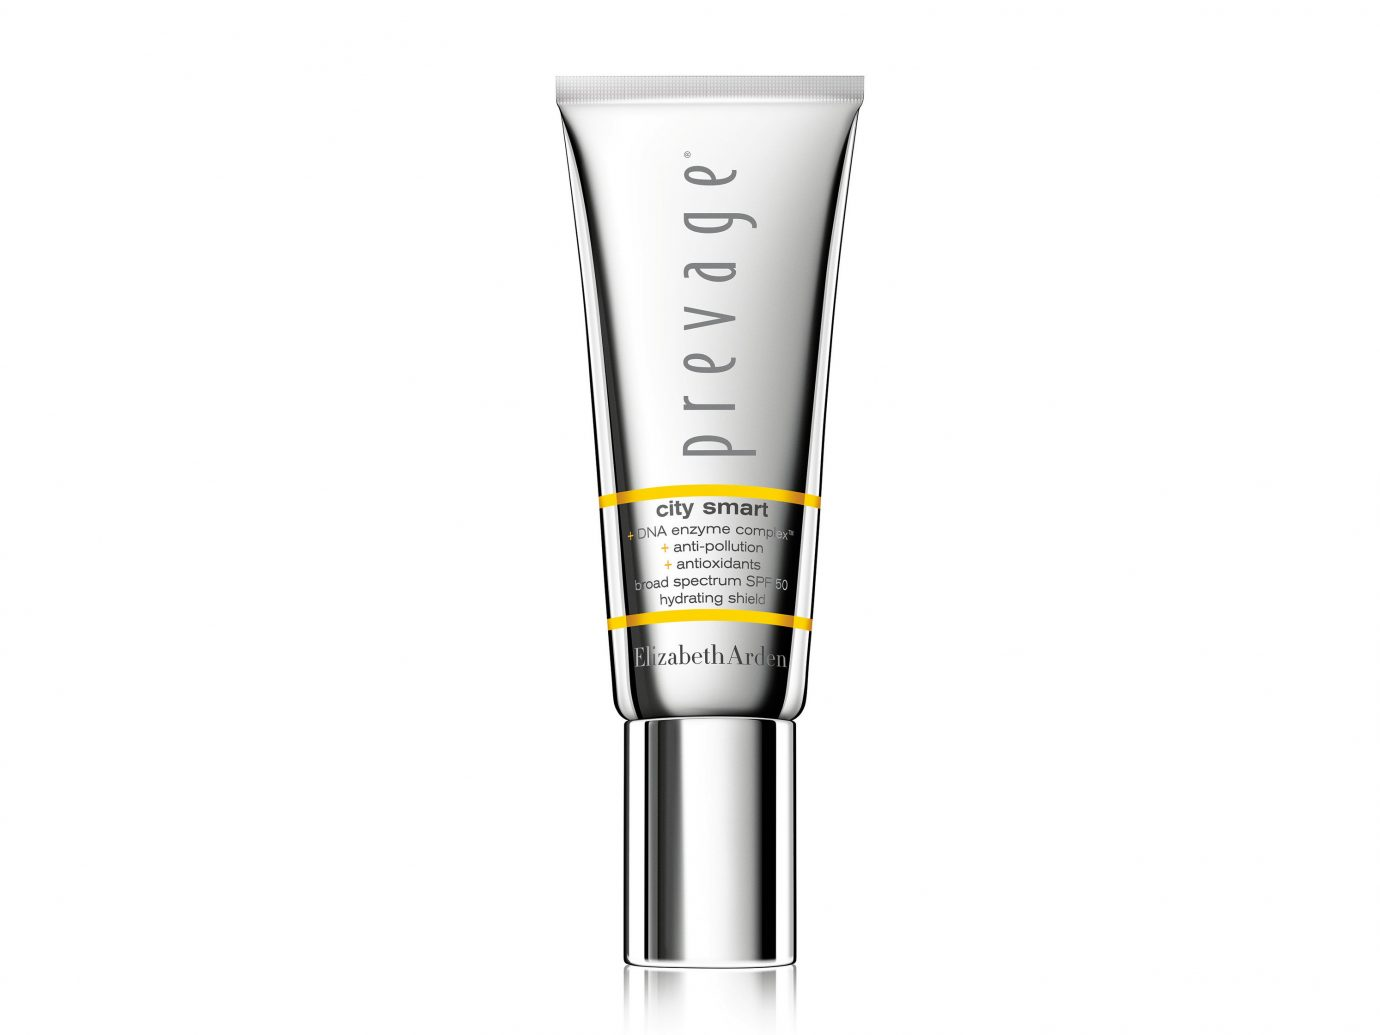 Wellness product skin cream cosmetics skin care